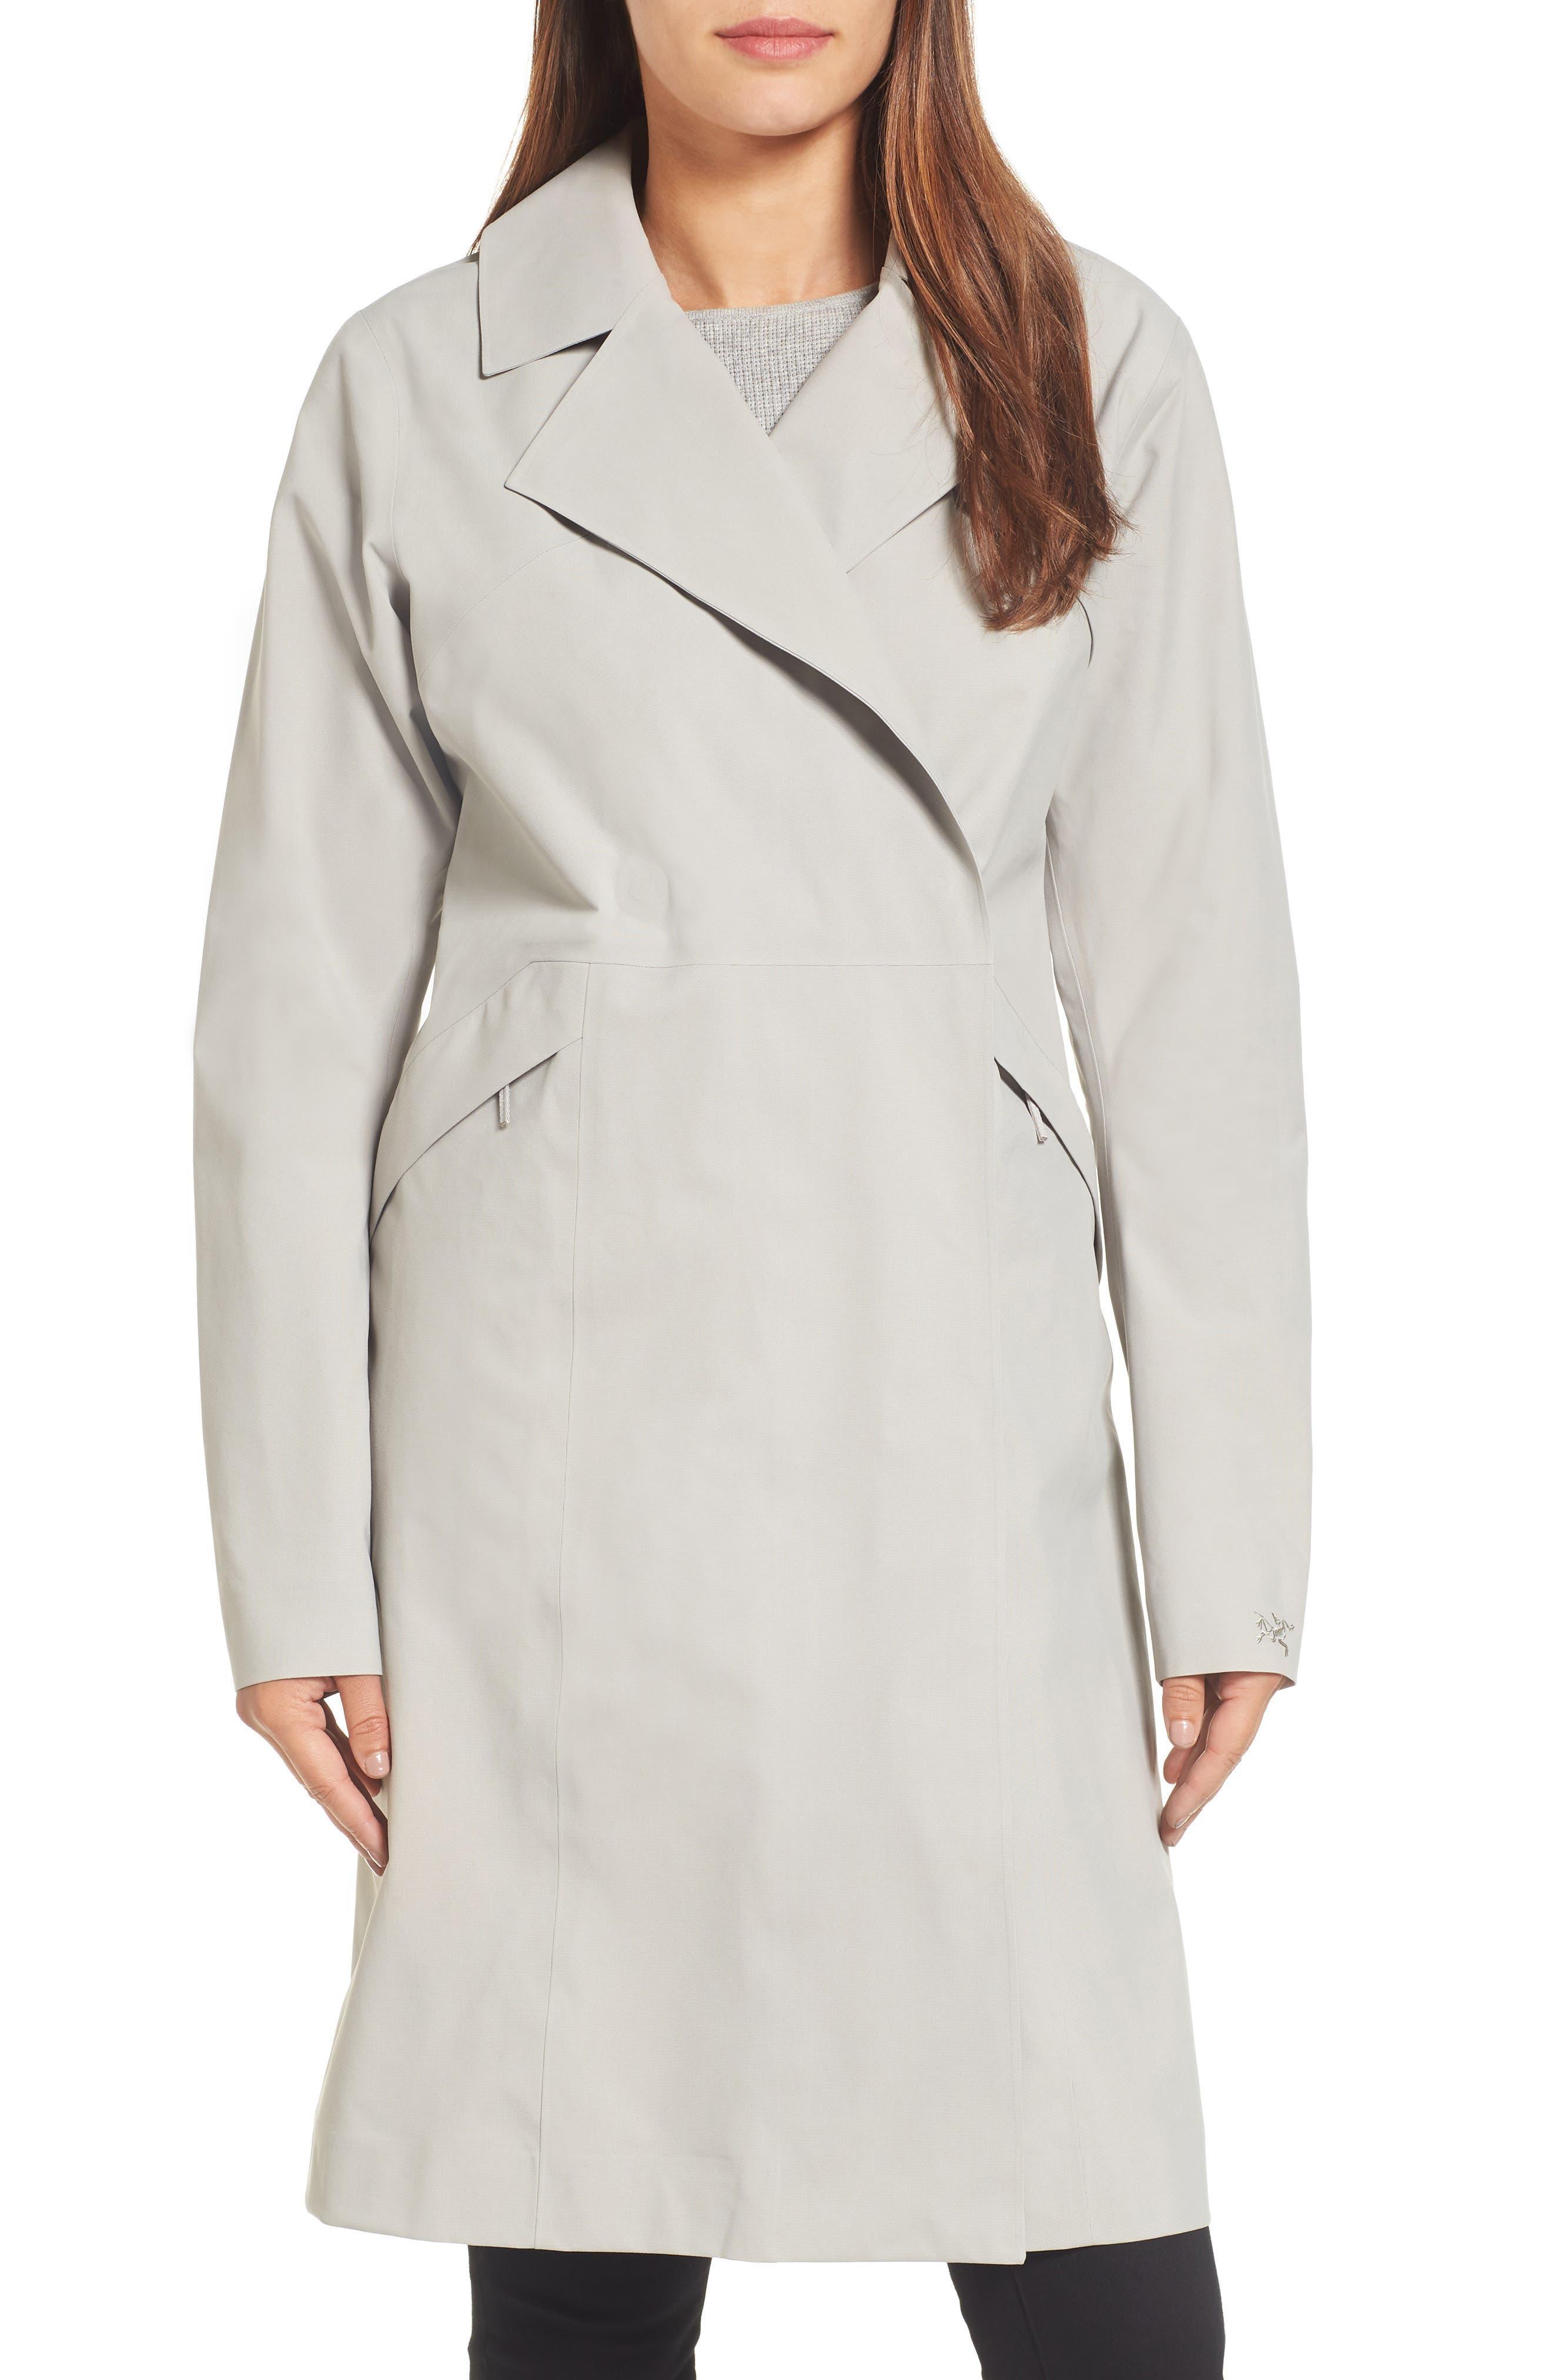 Nila Gore-Tex<sup>®</sup> Trench Coat,                             Main thumbnail 1, color,                             Fawn